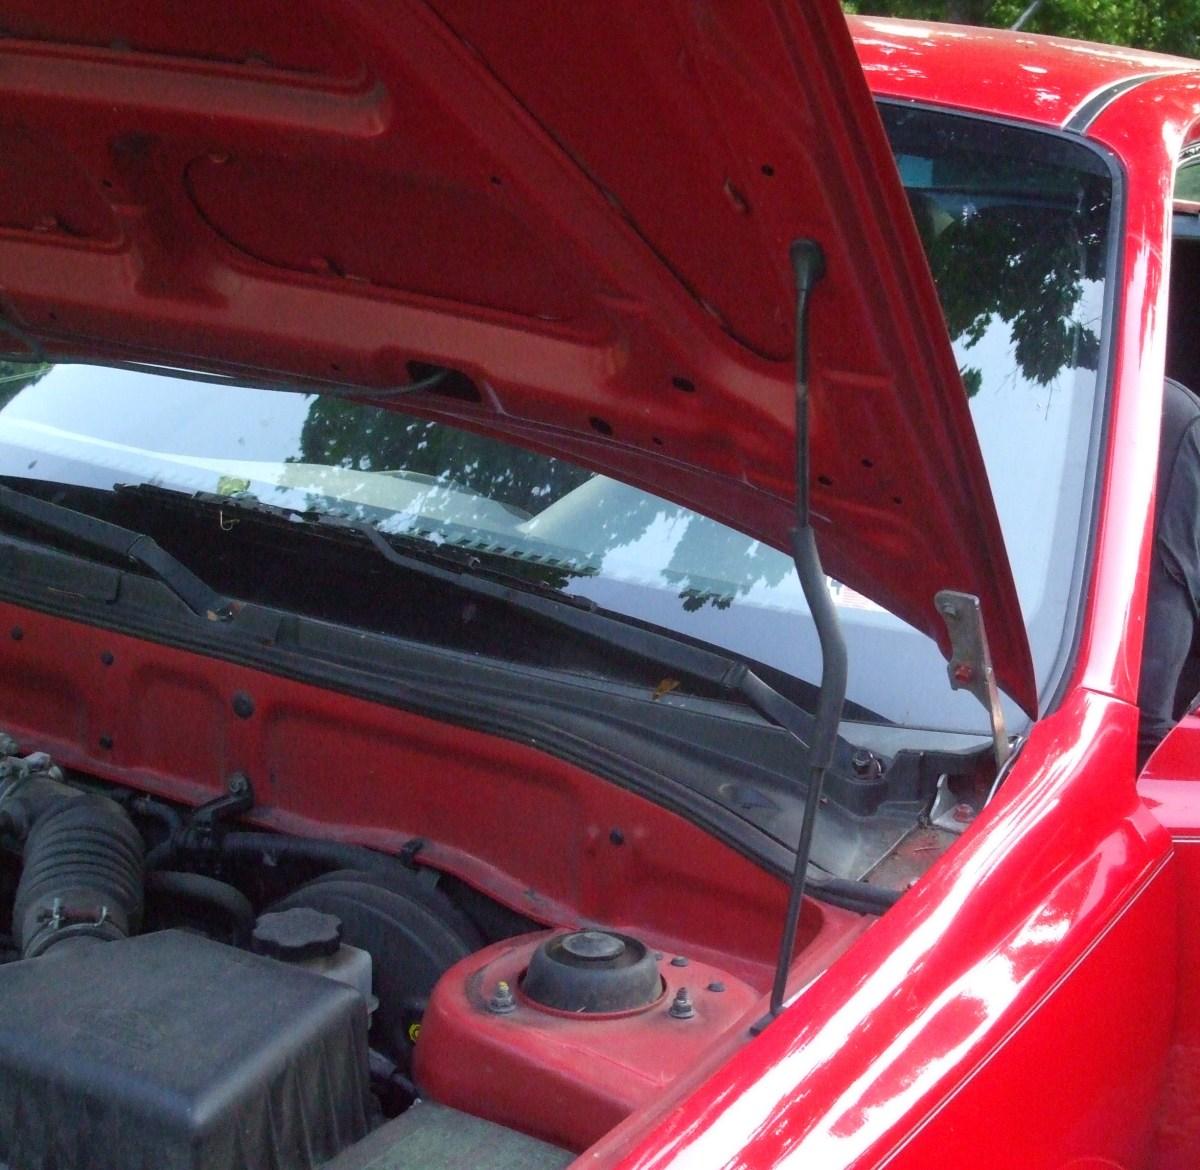 Rod holding up car hood.